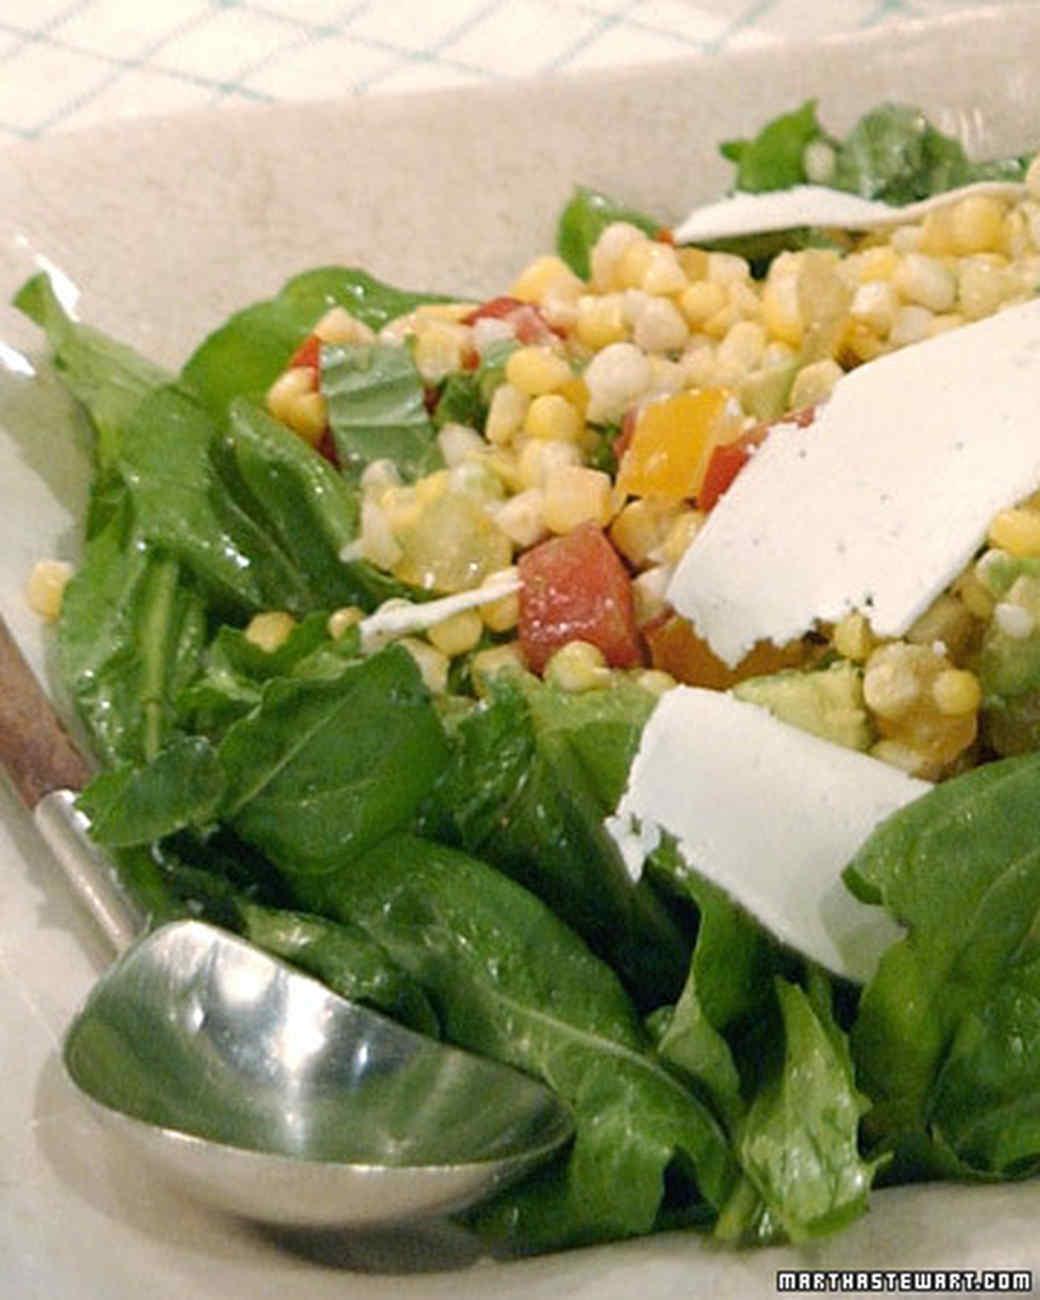 Corn, Tomato, and Avocado Salad